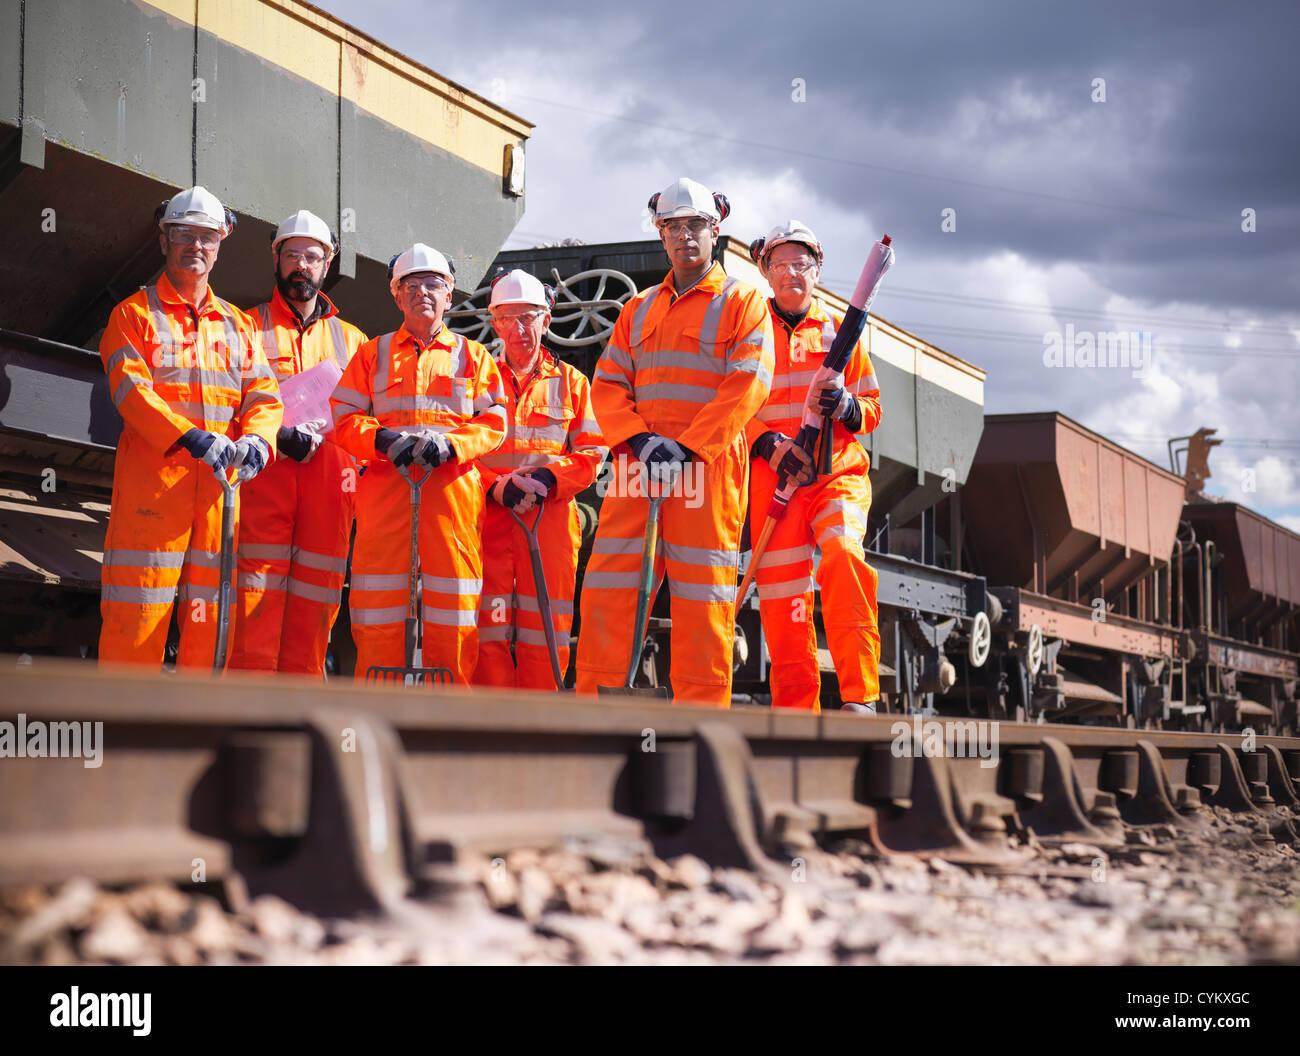 Railway workers standing on train tracks - Stock Image